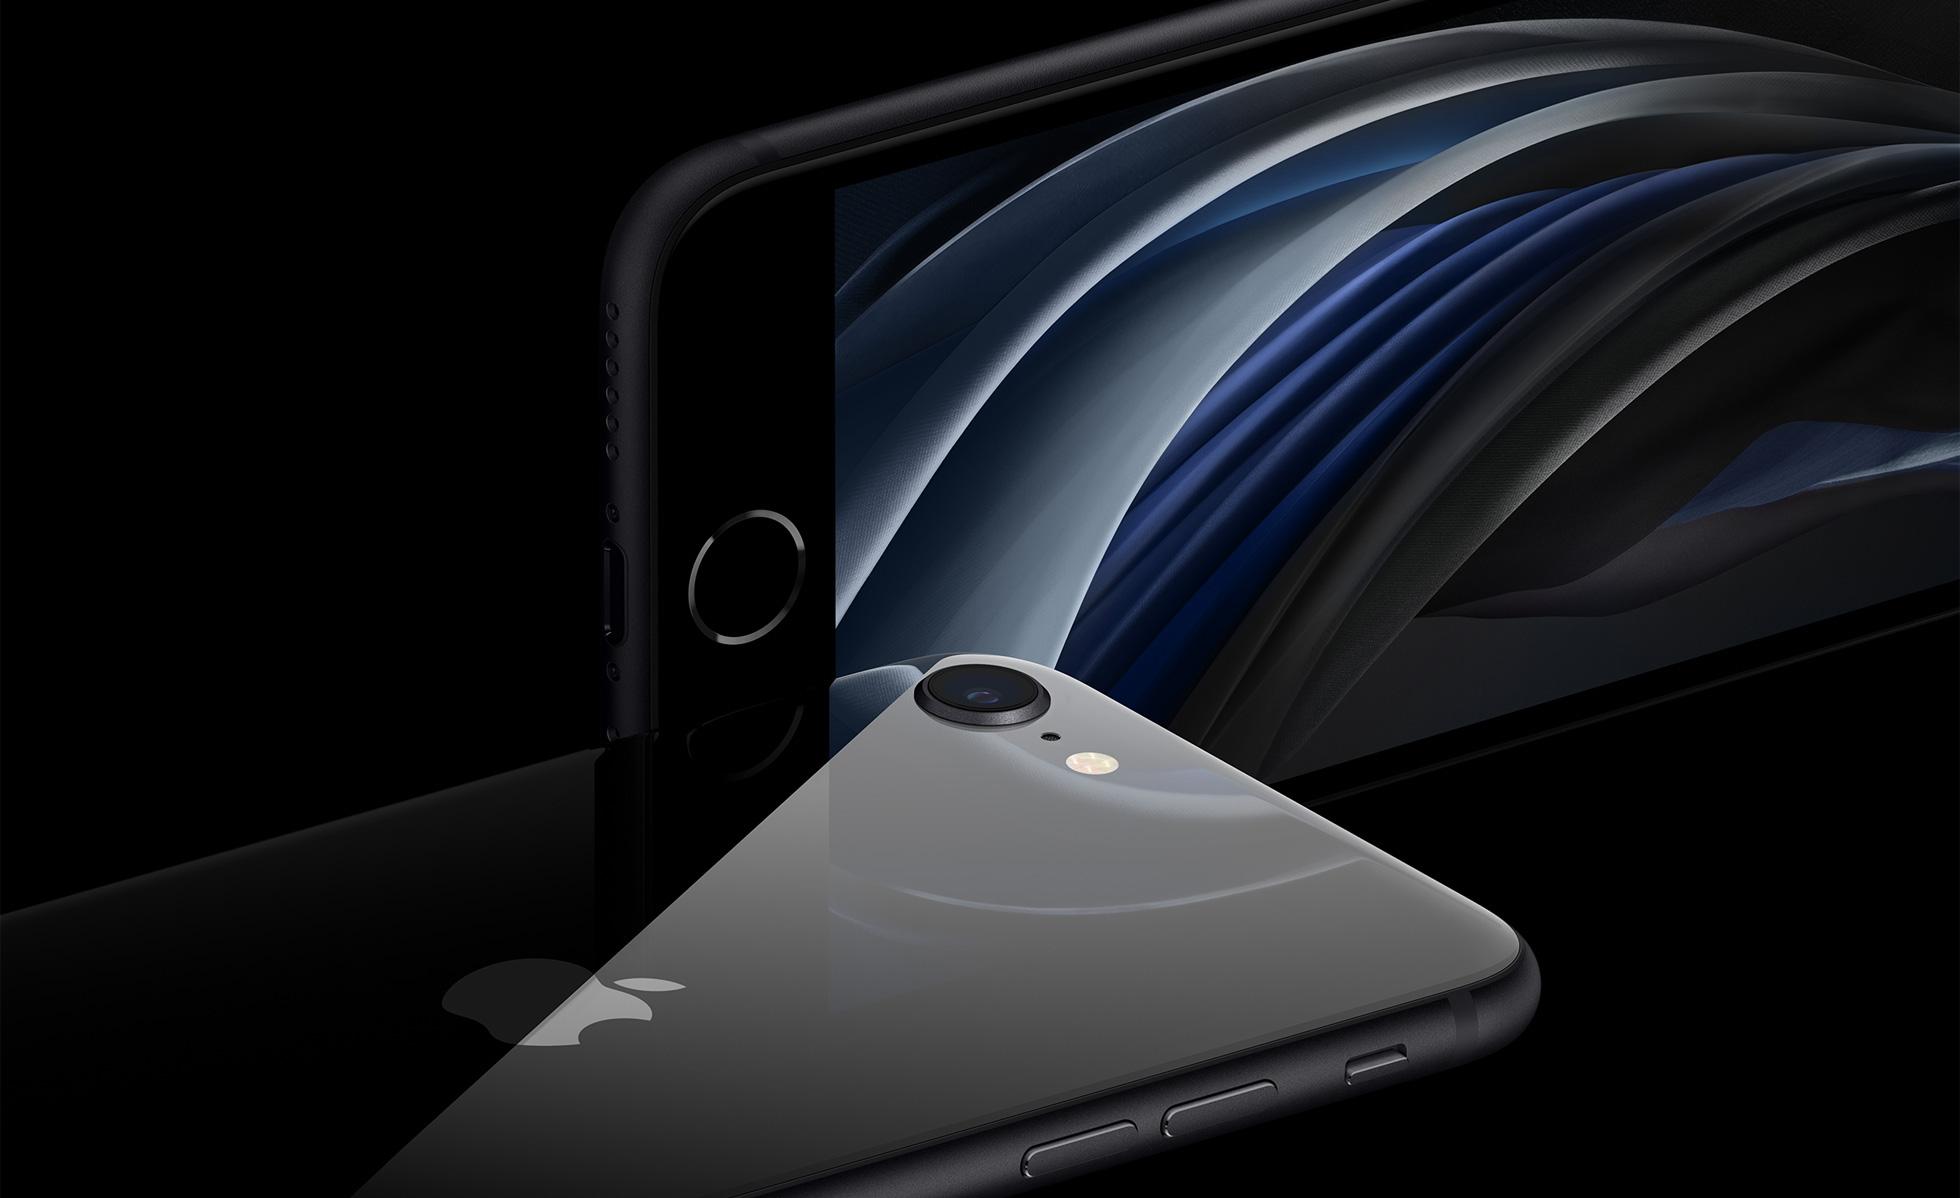 Apple iPhone iPhone SE celular teléfono iPhone 11 Pro iPhone XR iPhone 11 coronavirus